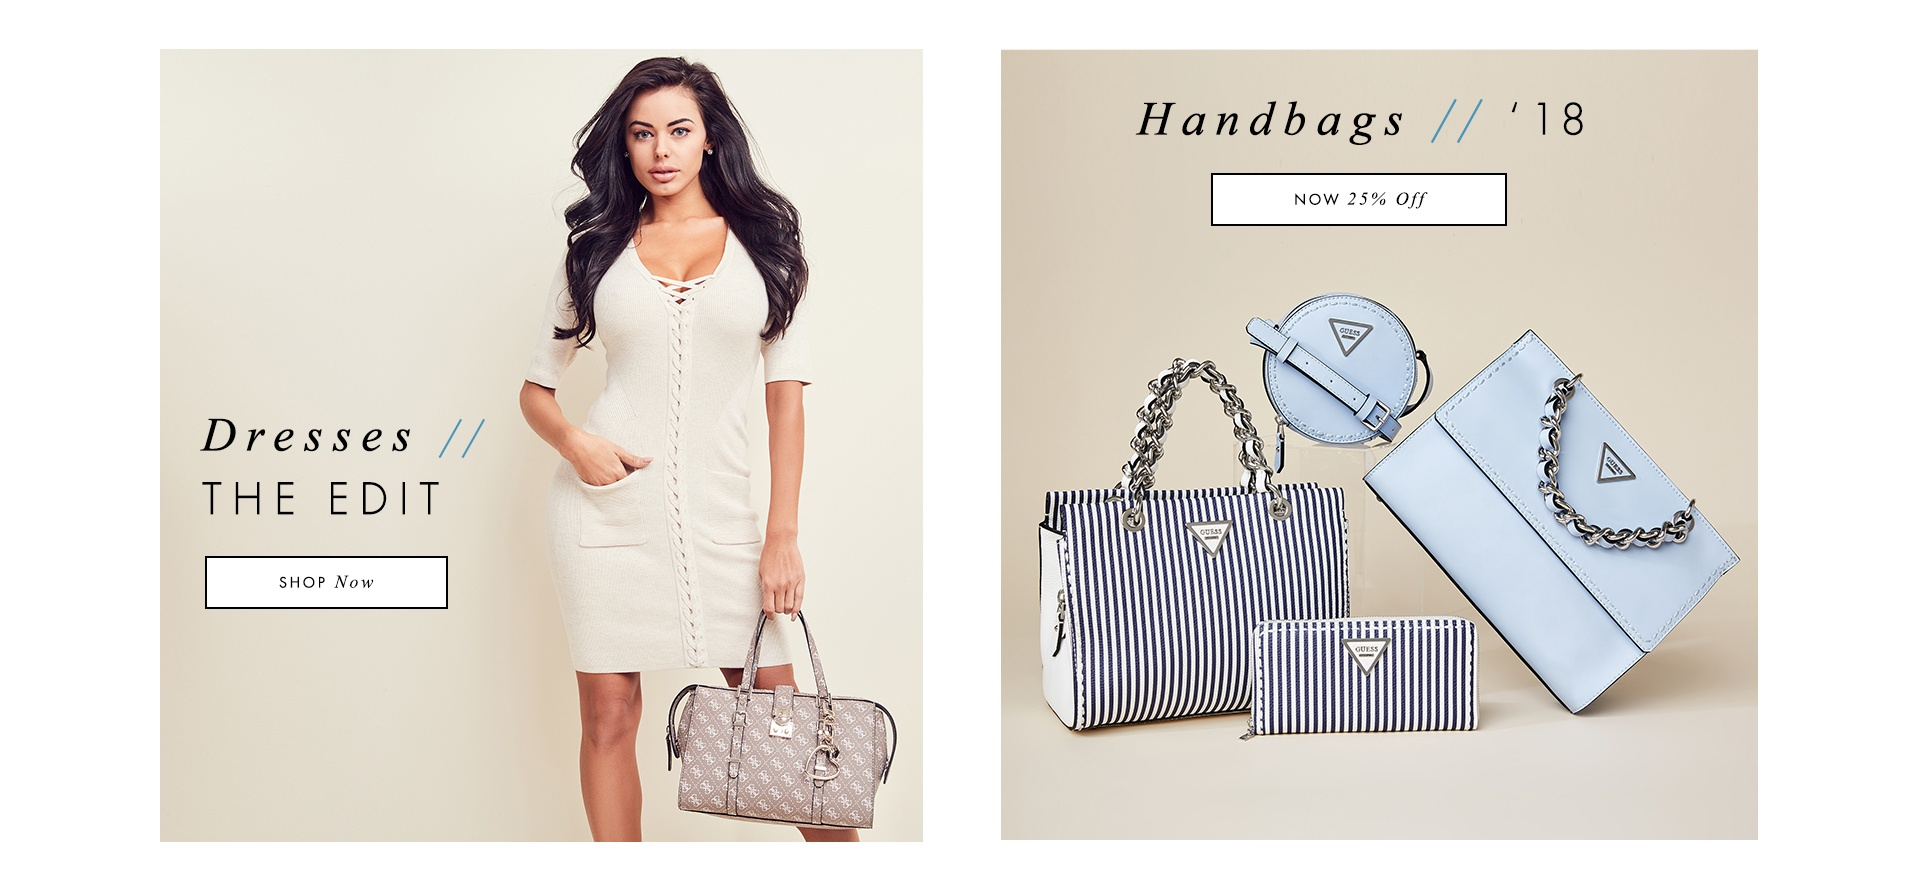 Shop Dresses and Handbags